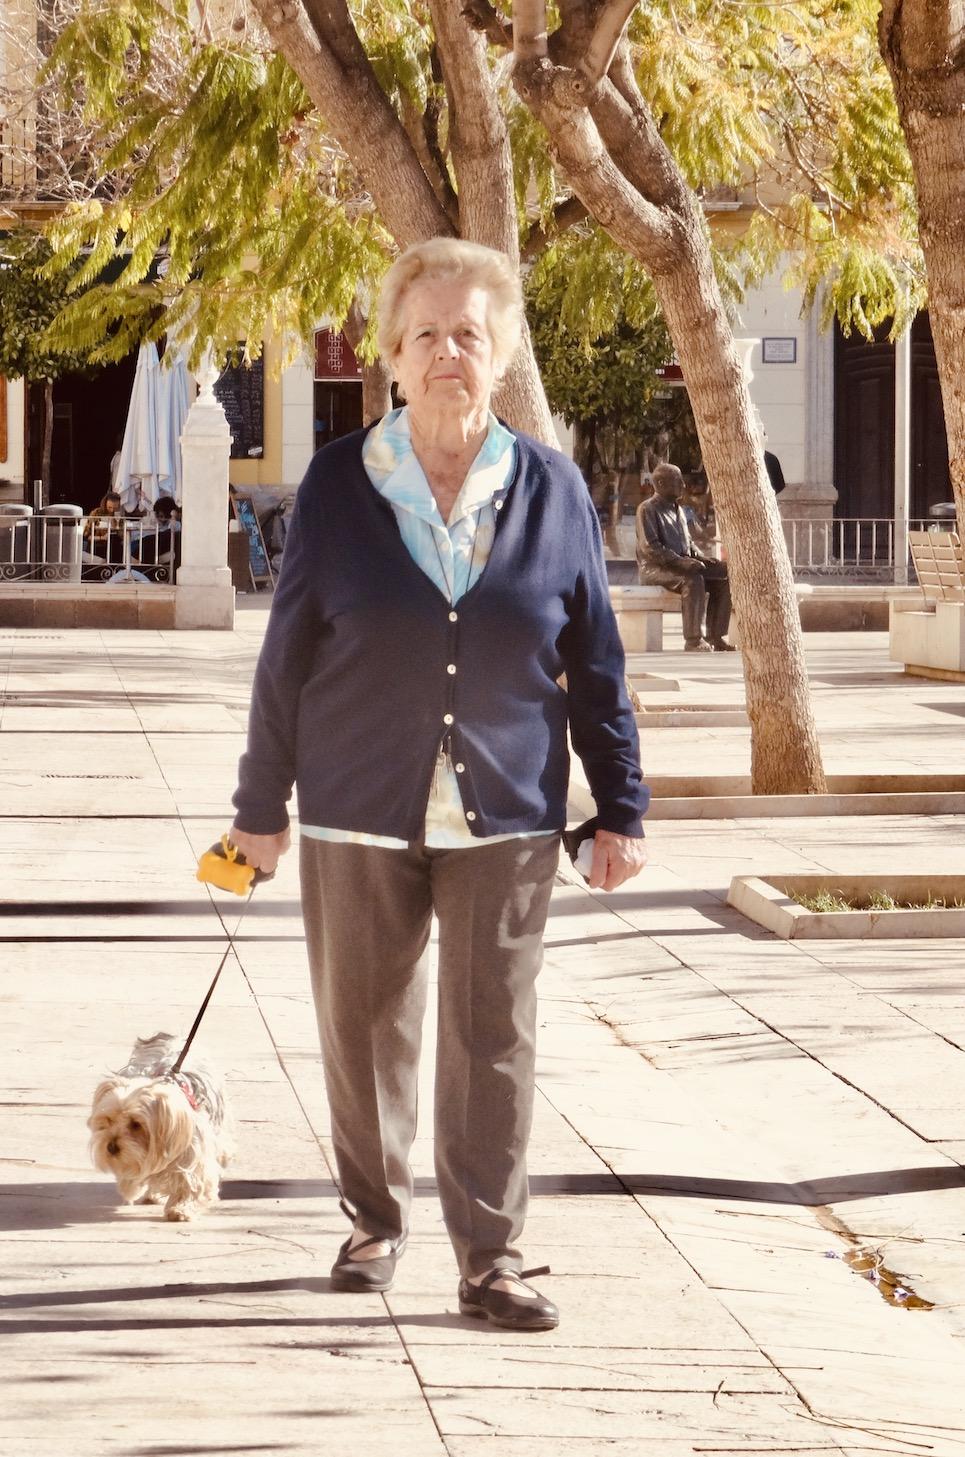 Old woman walking dog Malaga Spain